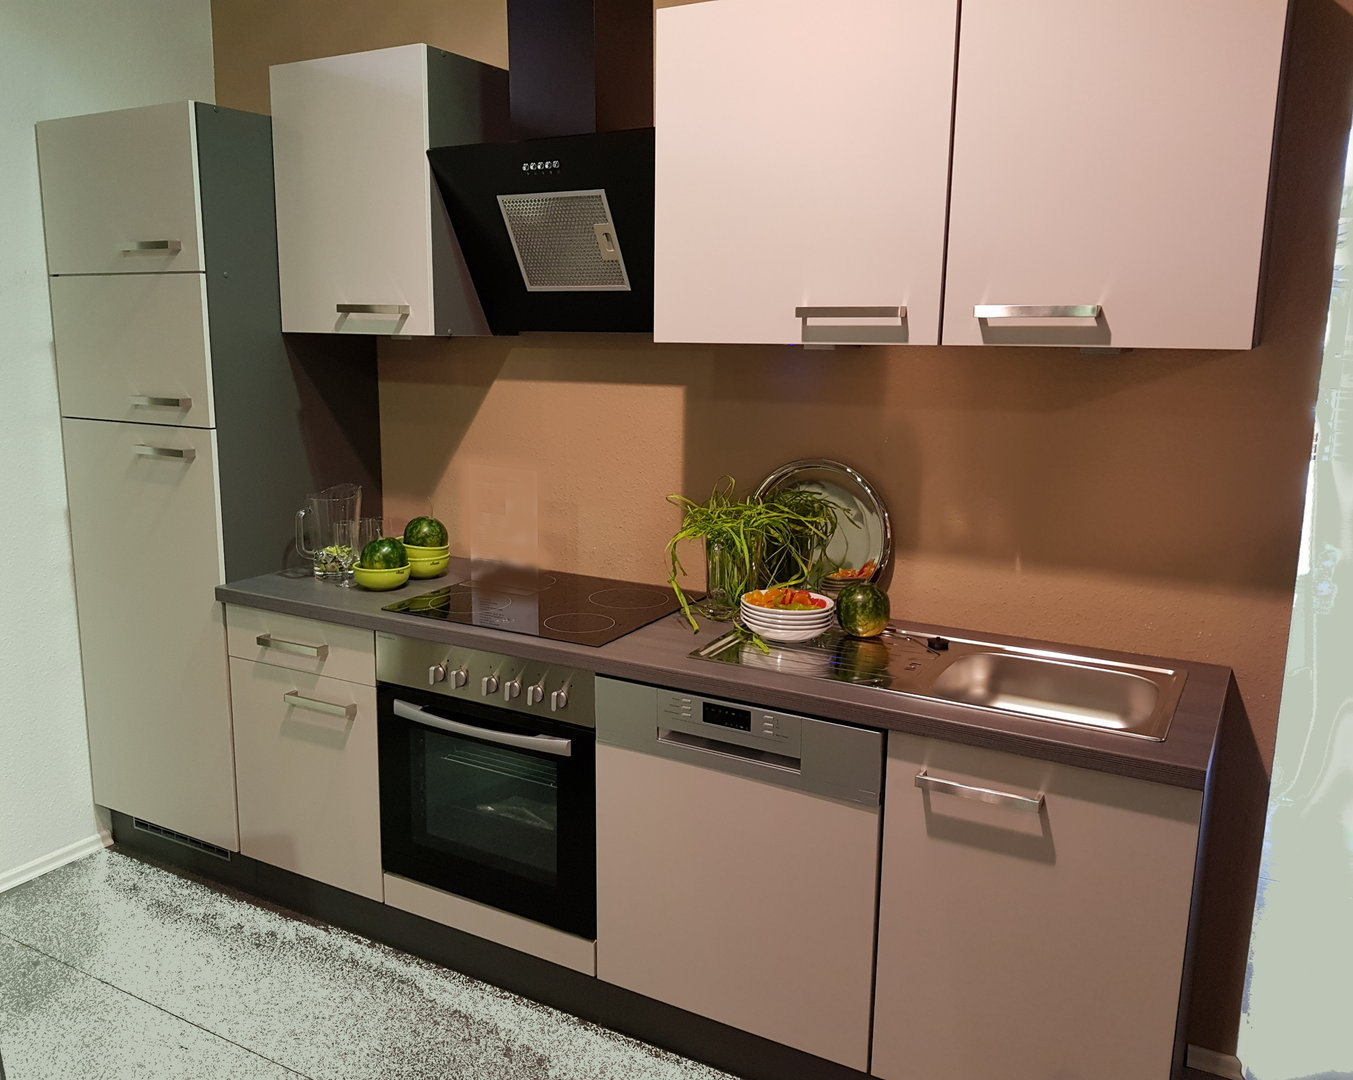 Full Size of Küche Ohne Elektrogeräte Kaufen Sinnvoll Komplette Küche Ohne Elektrogeräte Küche Ohne Elektrogeräte Günstig Kaufen Roller Küche Ohne Elektrogeräte Küche Küche Ohne Elektrogeräte